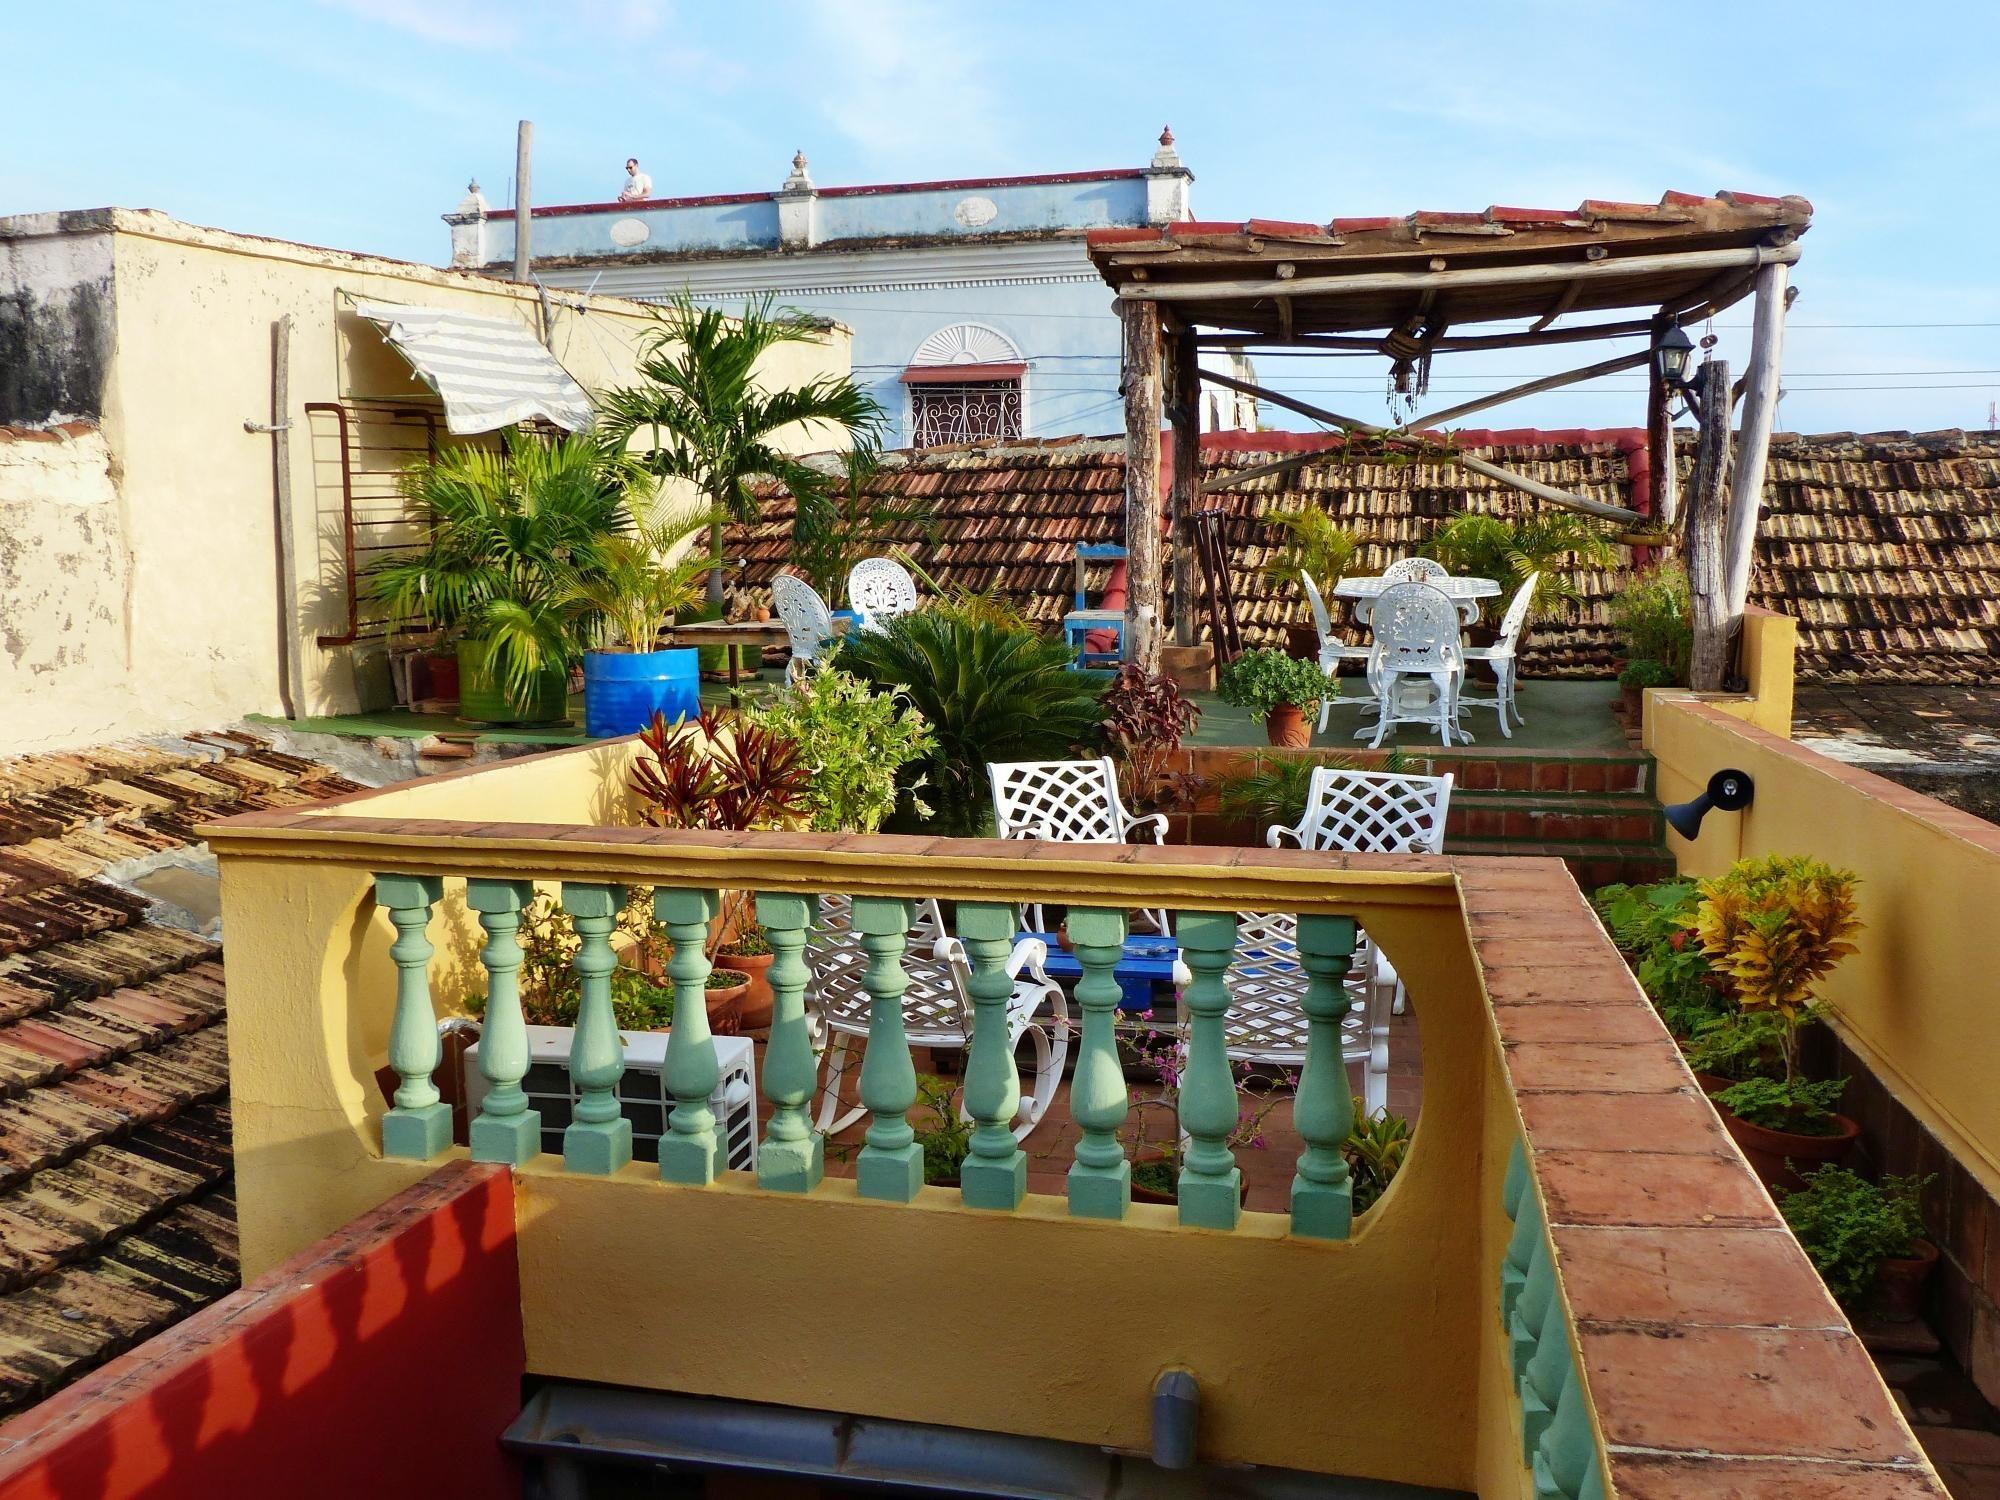 Casa MiCuba (Trinidad, Cuba) foto's, reviews en